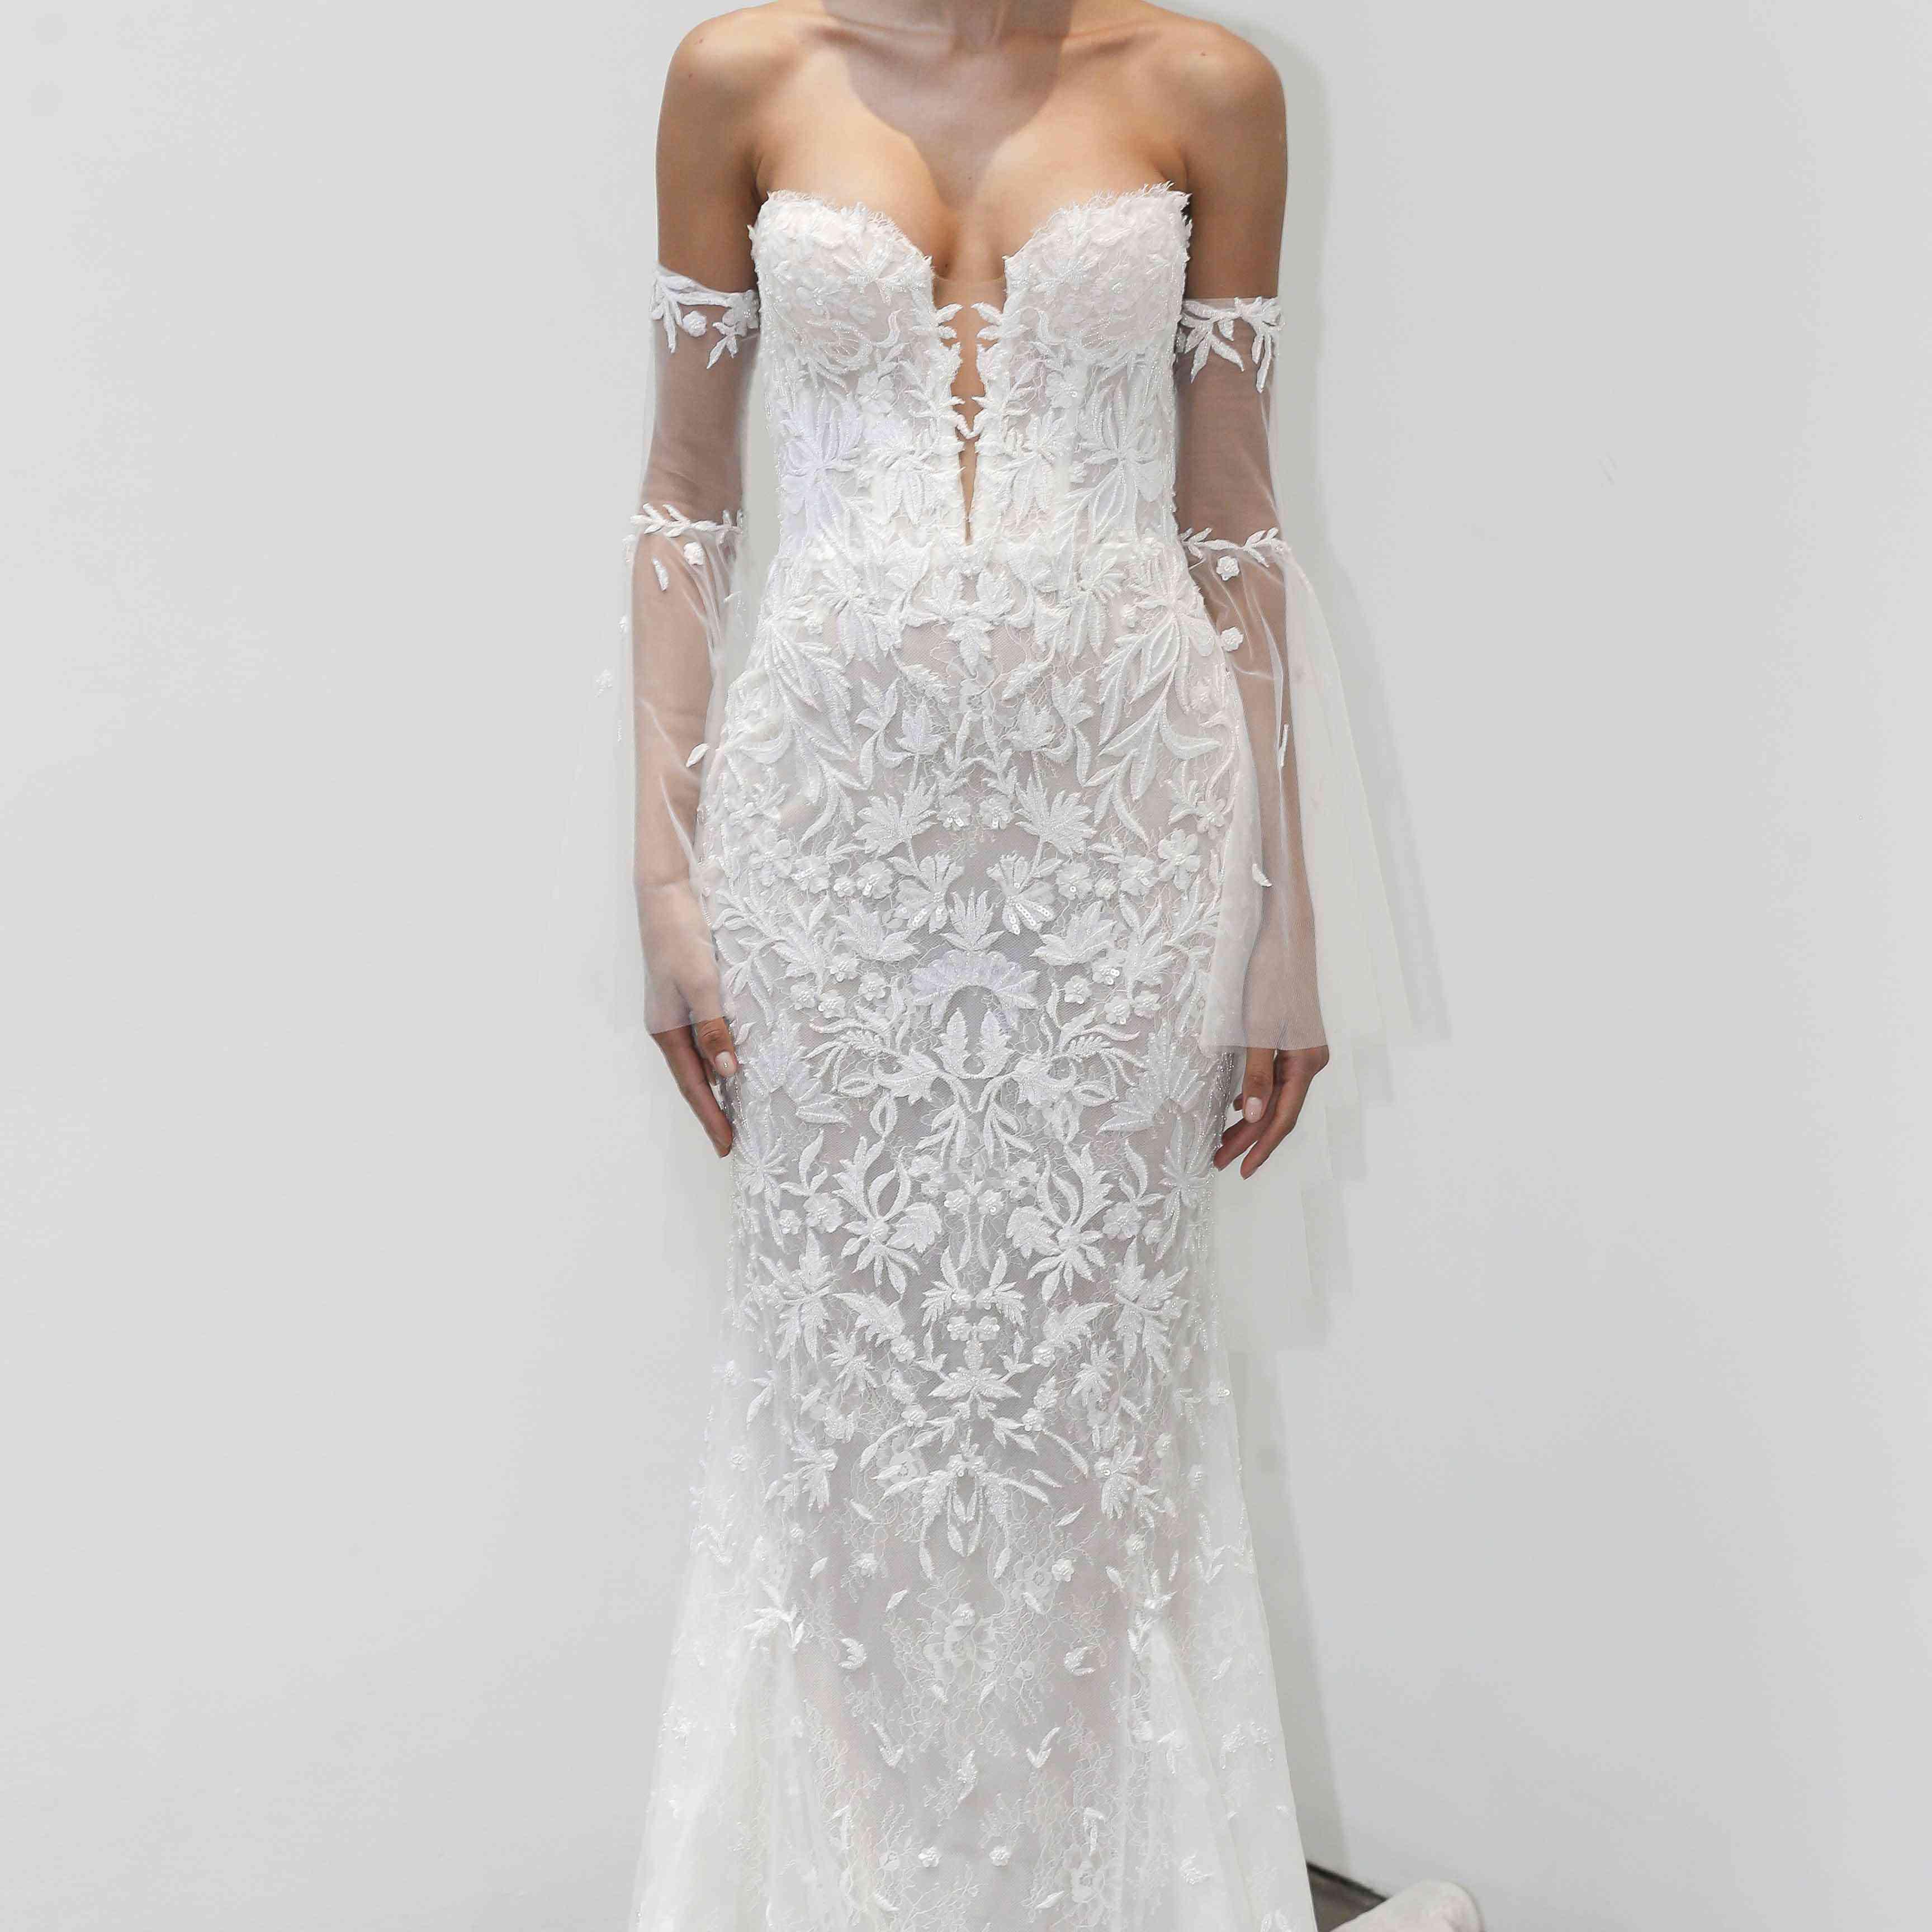 Alexis strapless sweetheart wedding dress